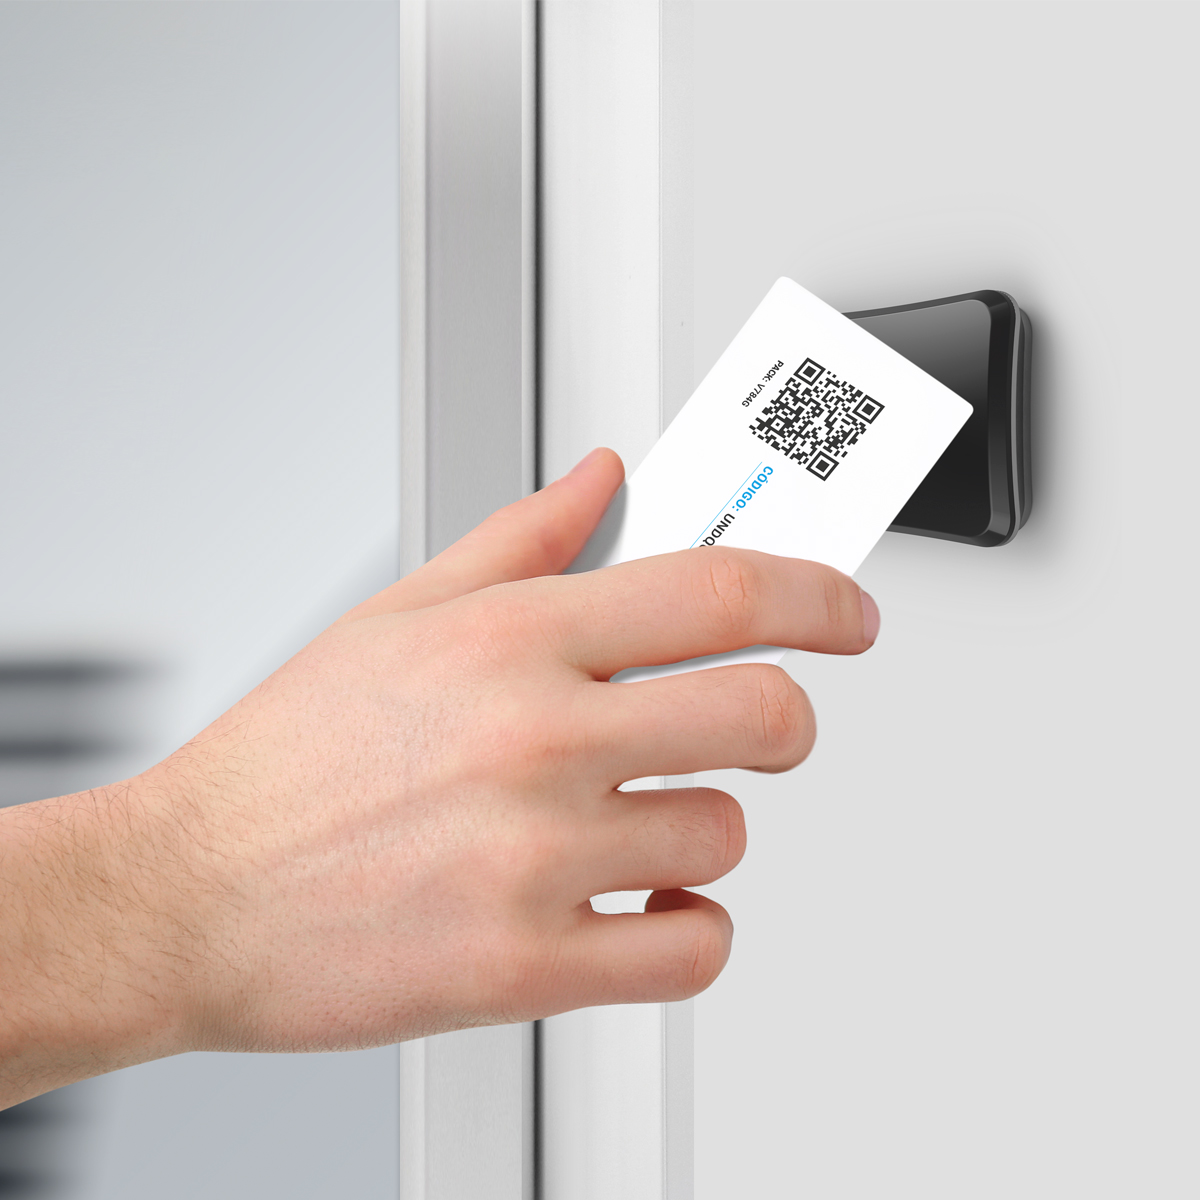 Pack de usuarios NFC